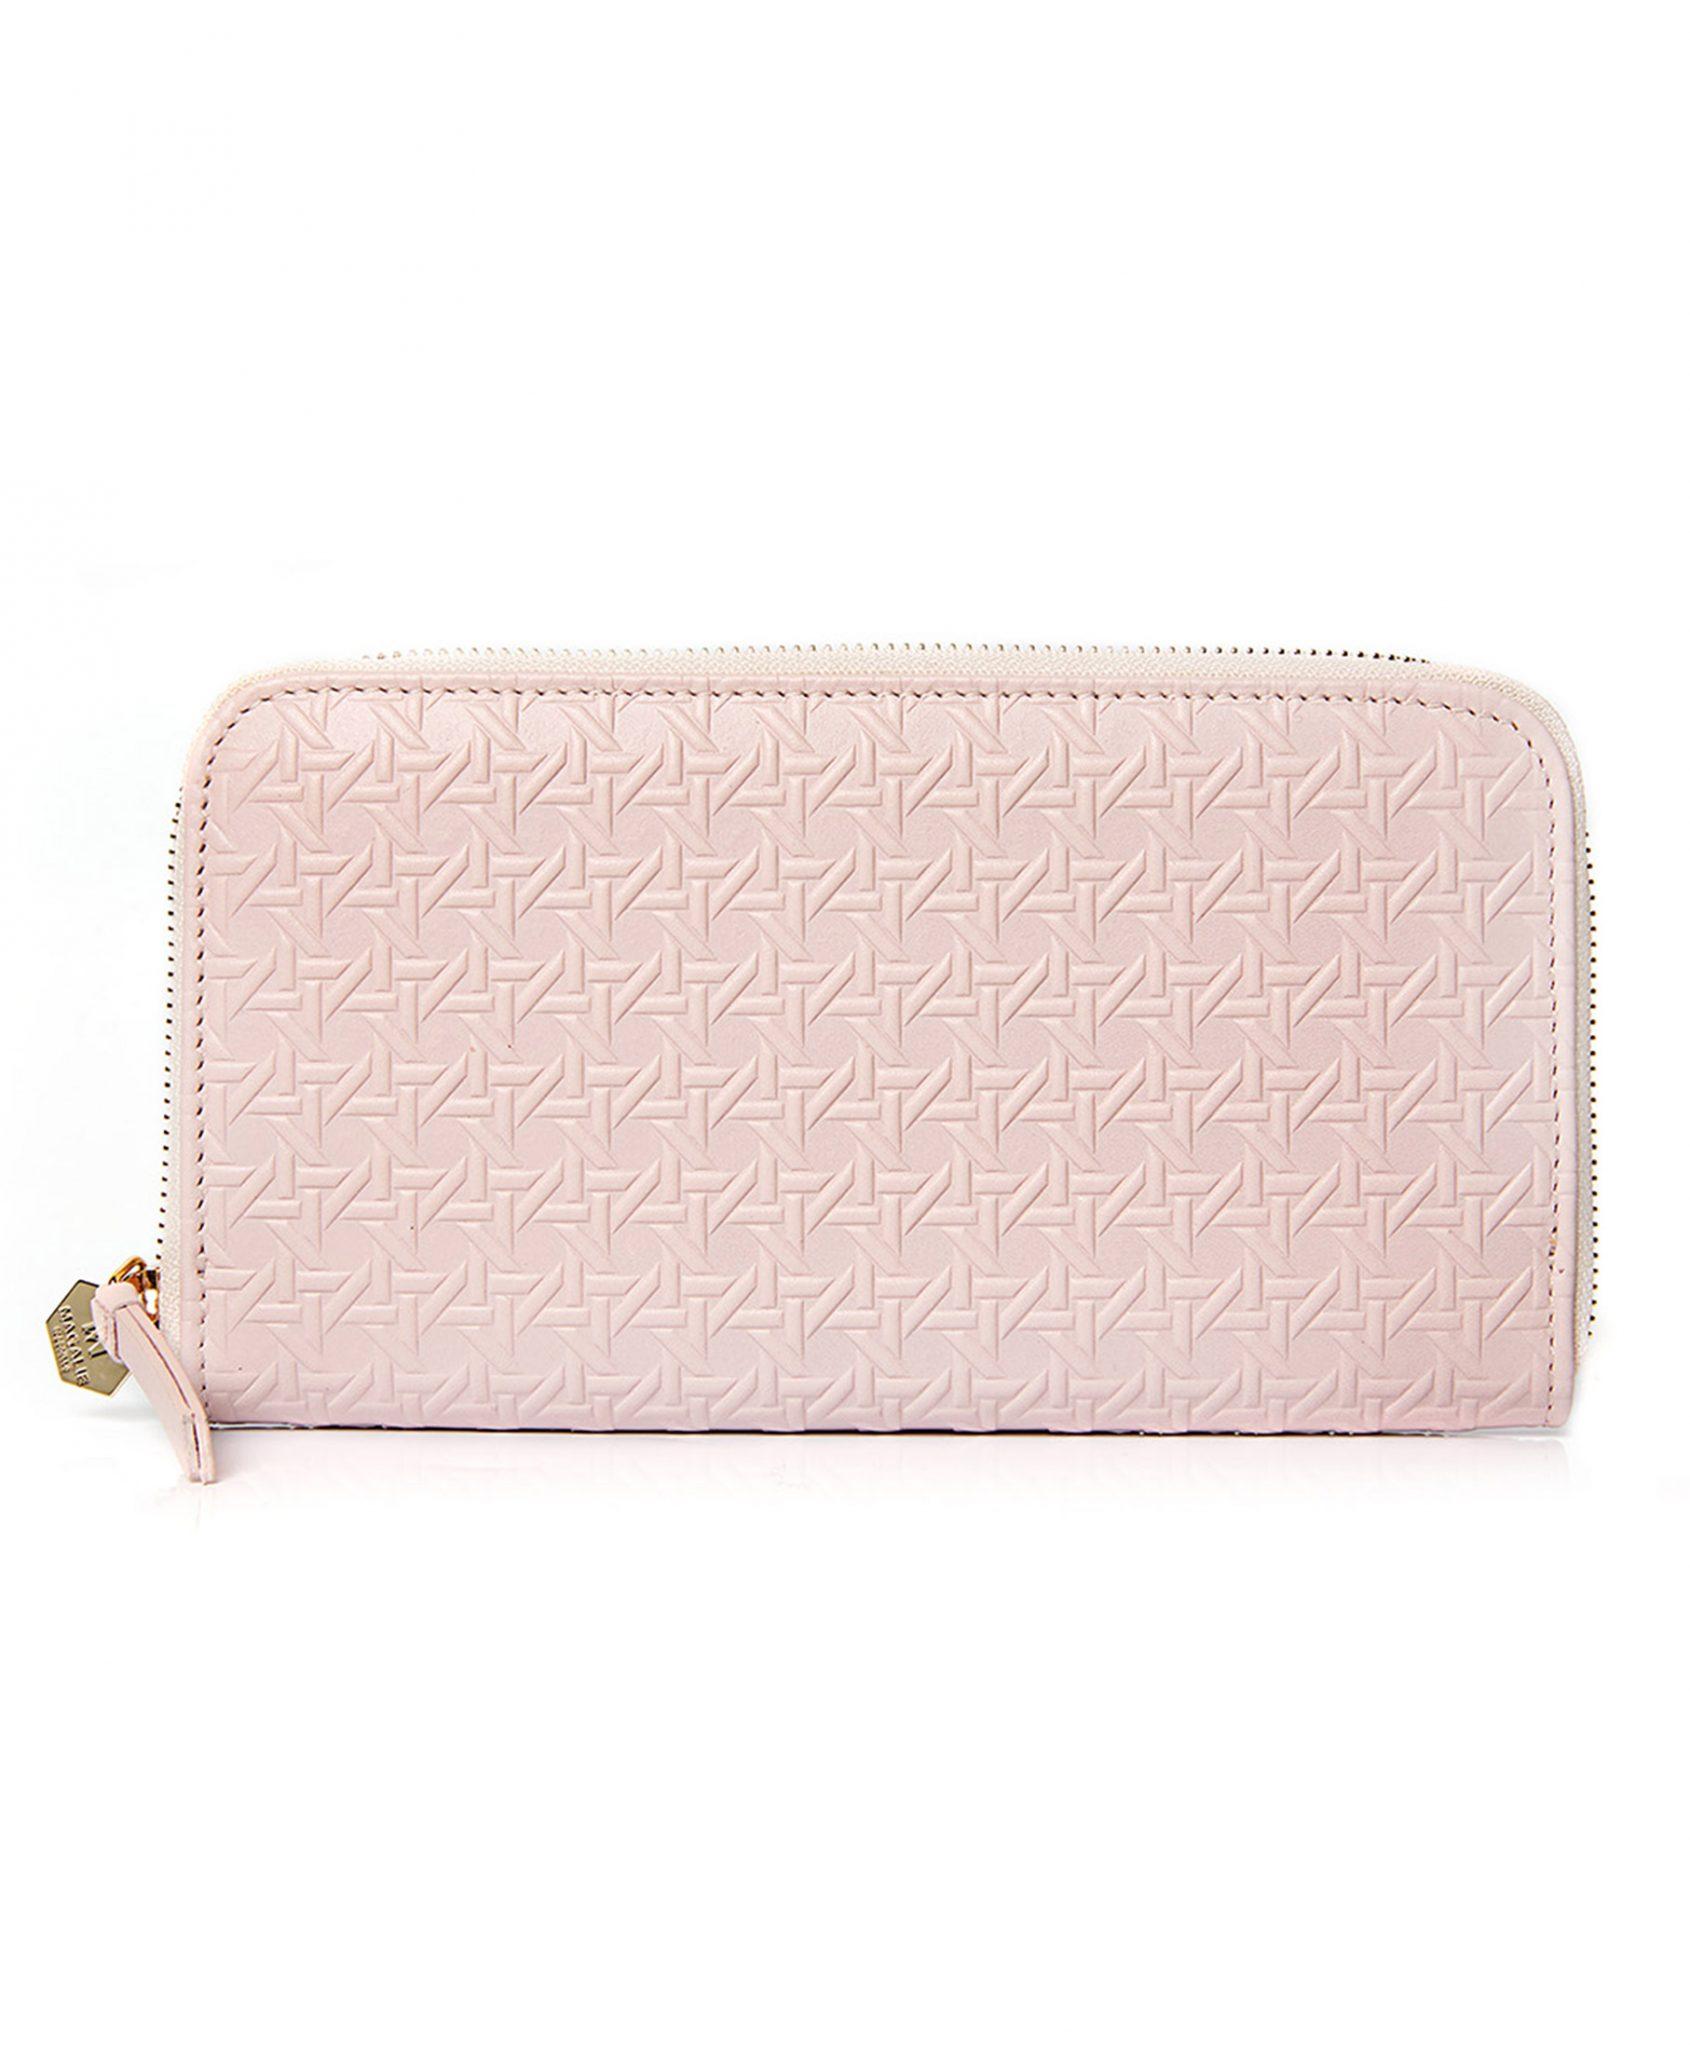 cartera billetera discrete de piel en tonos rosa pastel.